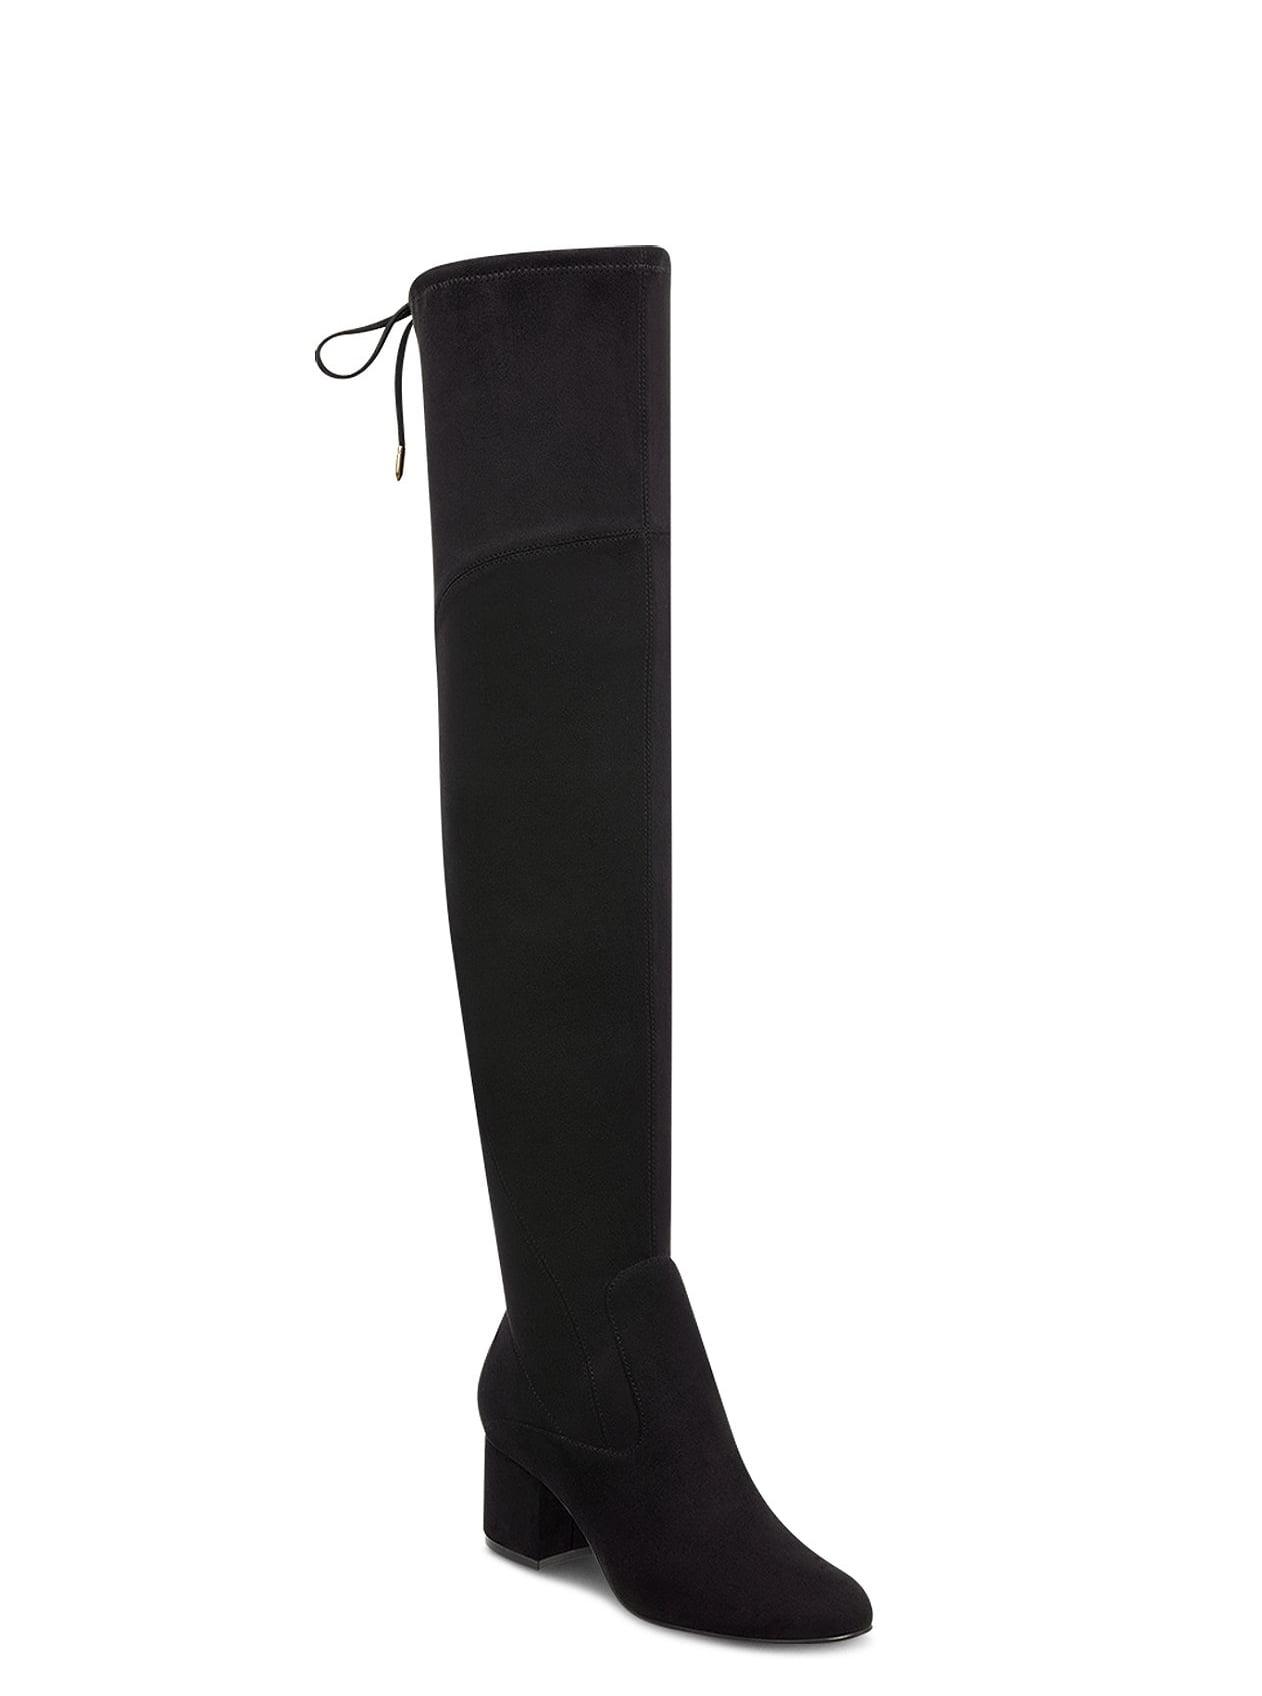 Pretta Tall Suede Boots